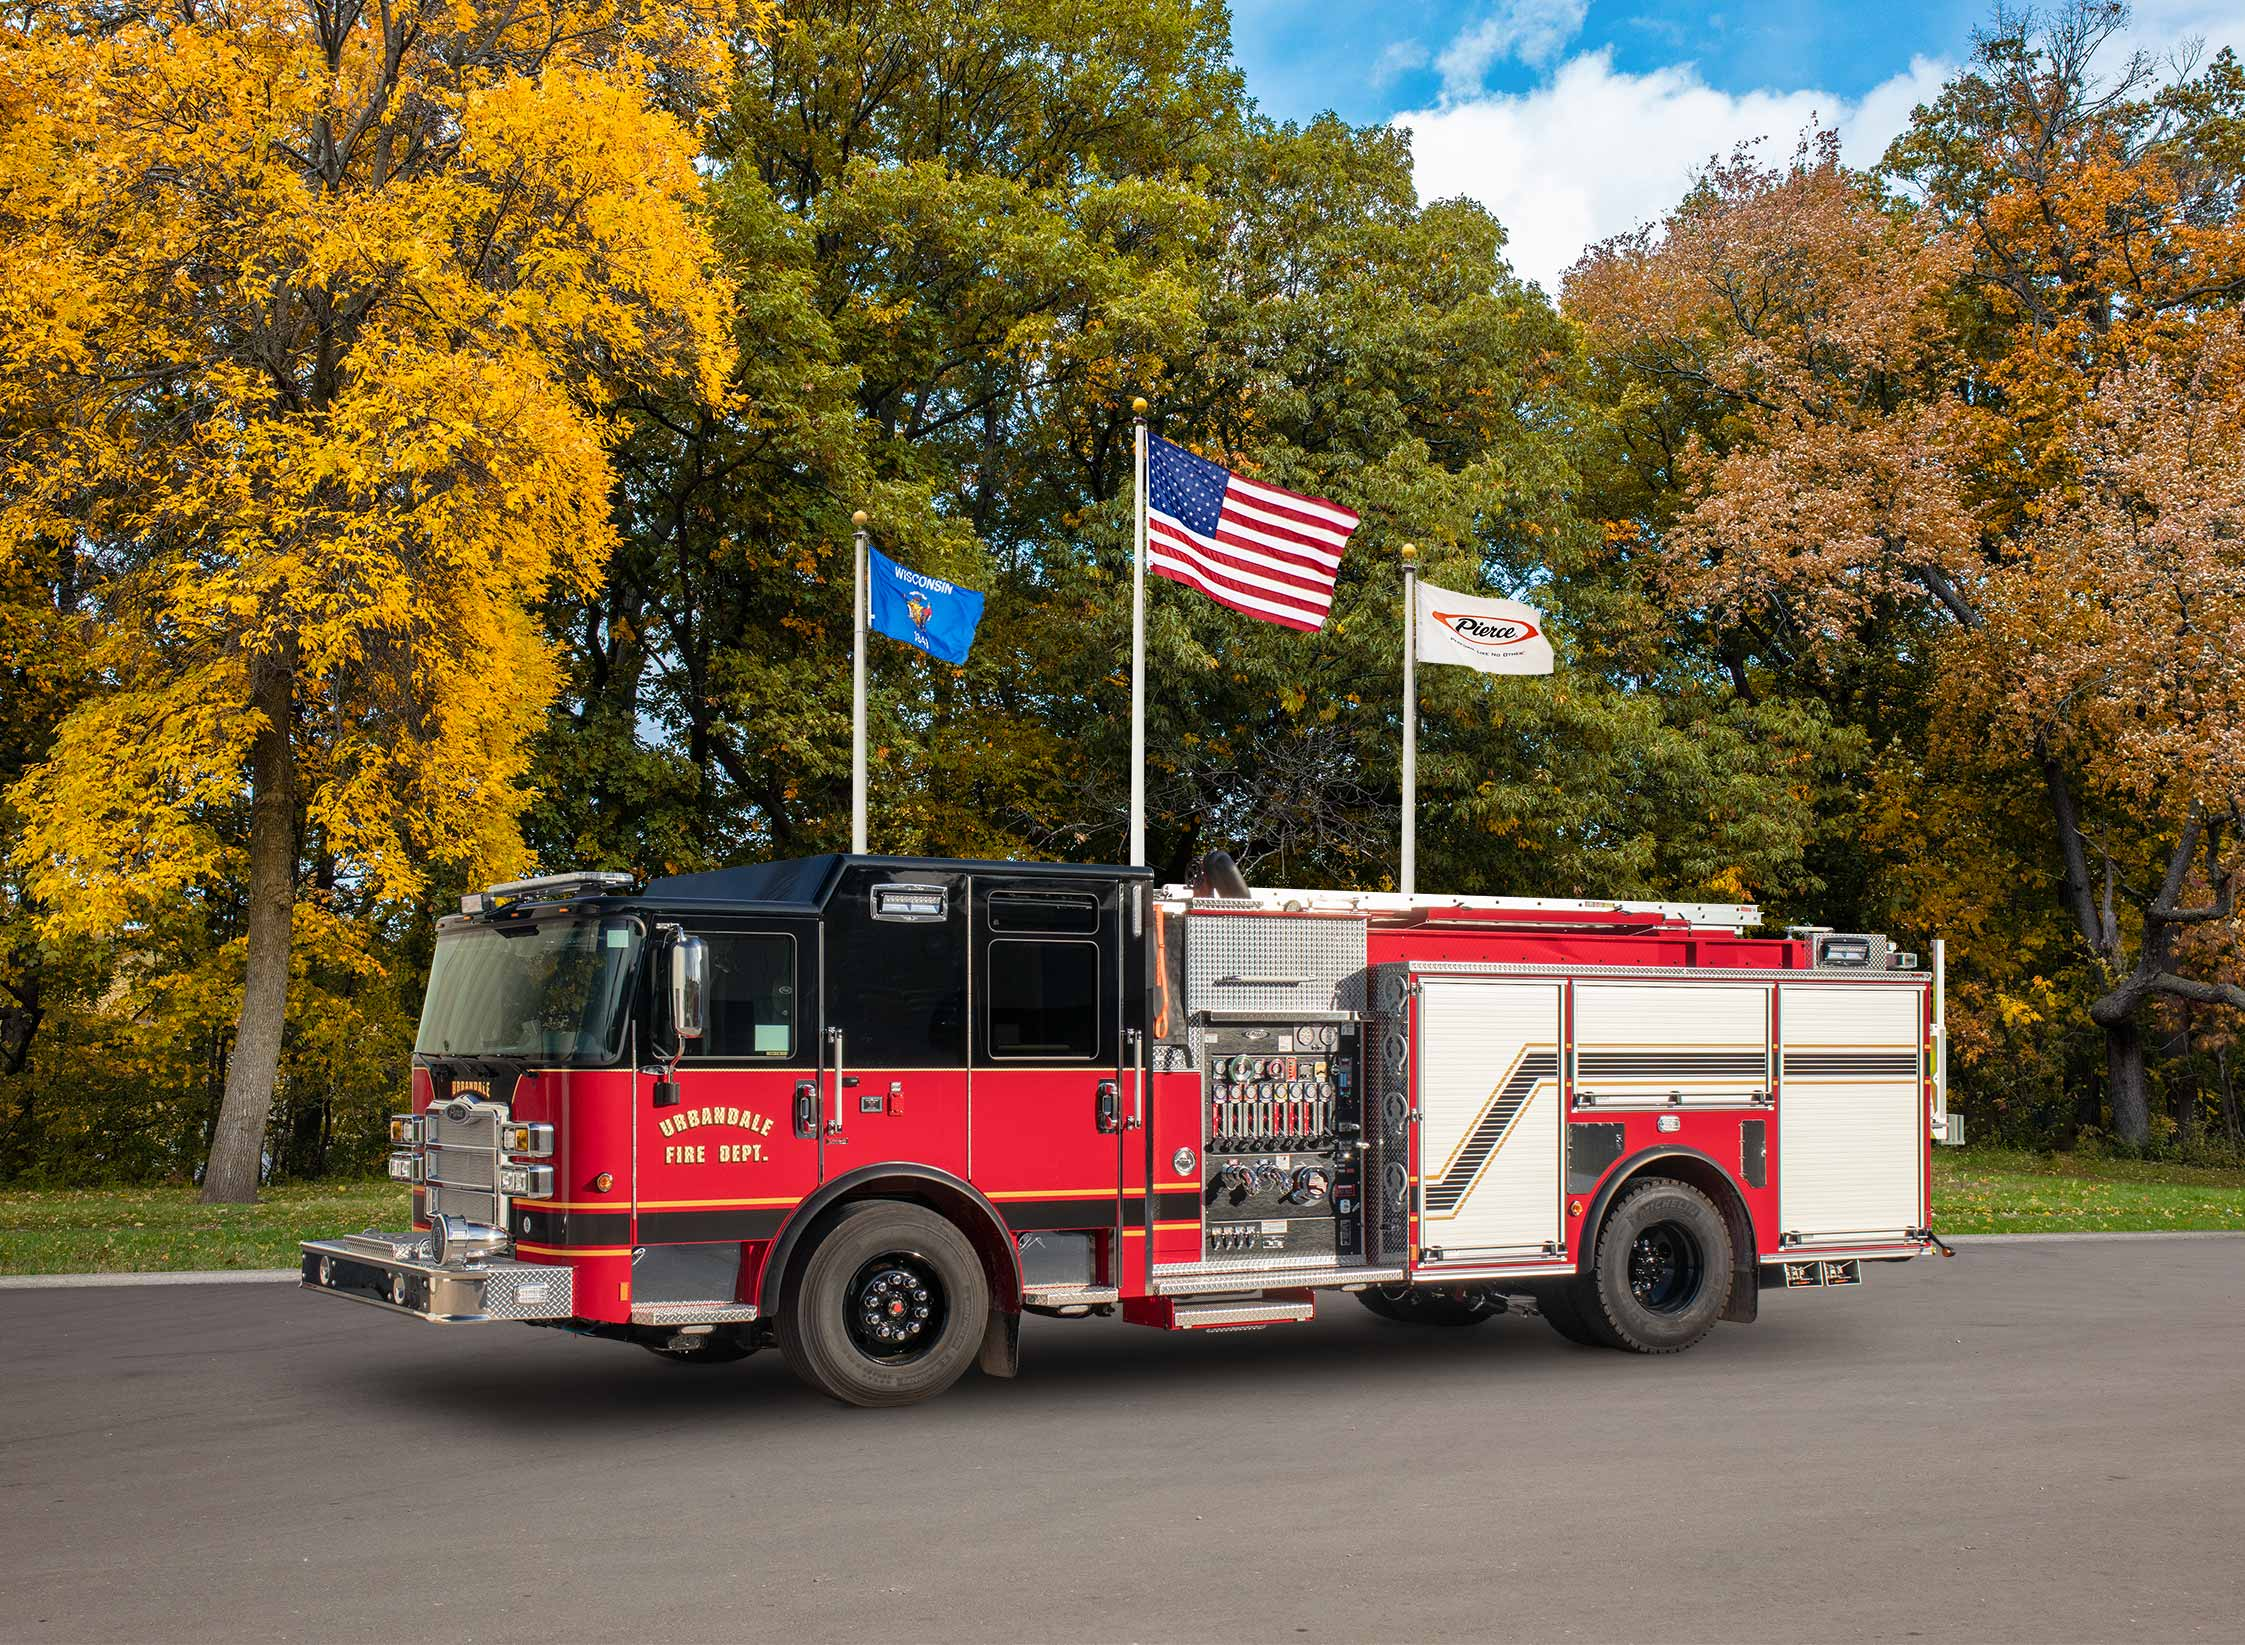 City of Urbandale Fire Department - Pumper